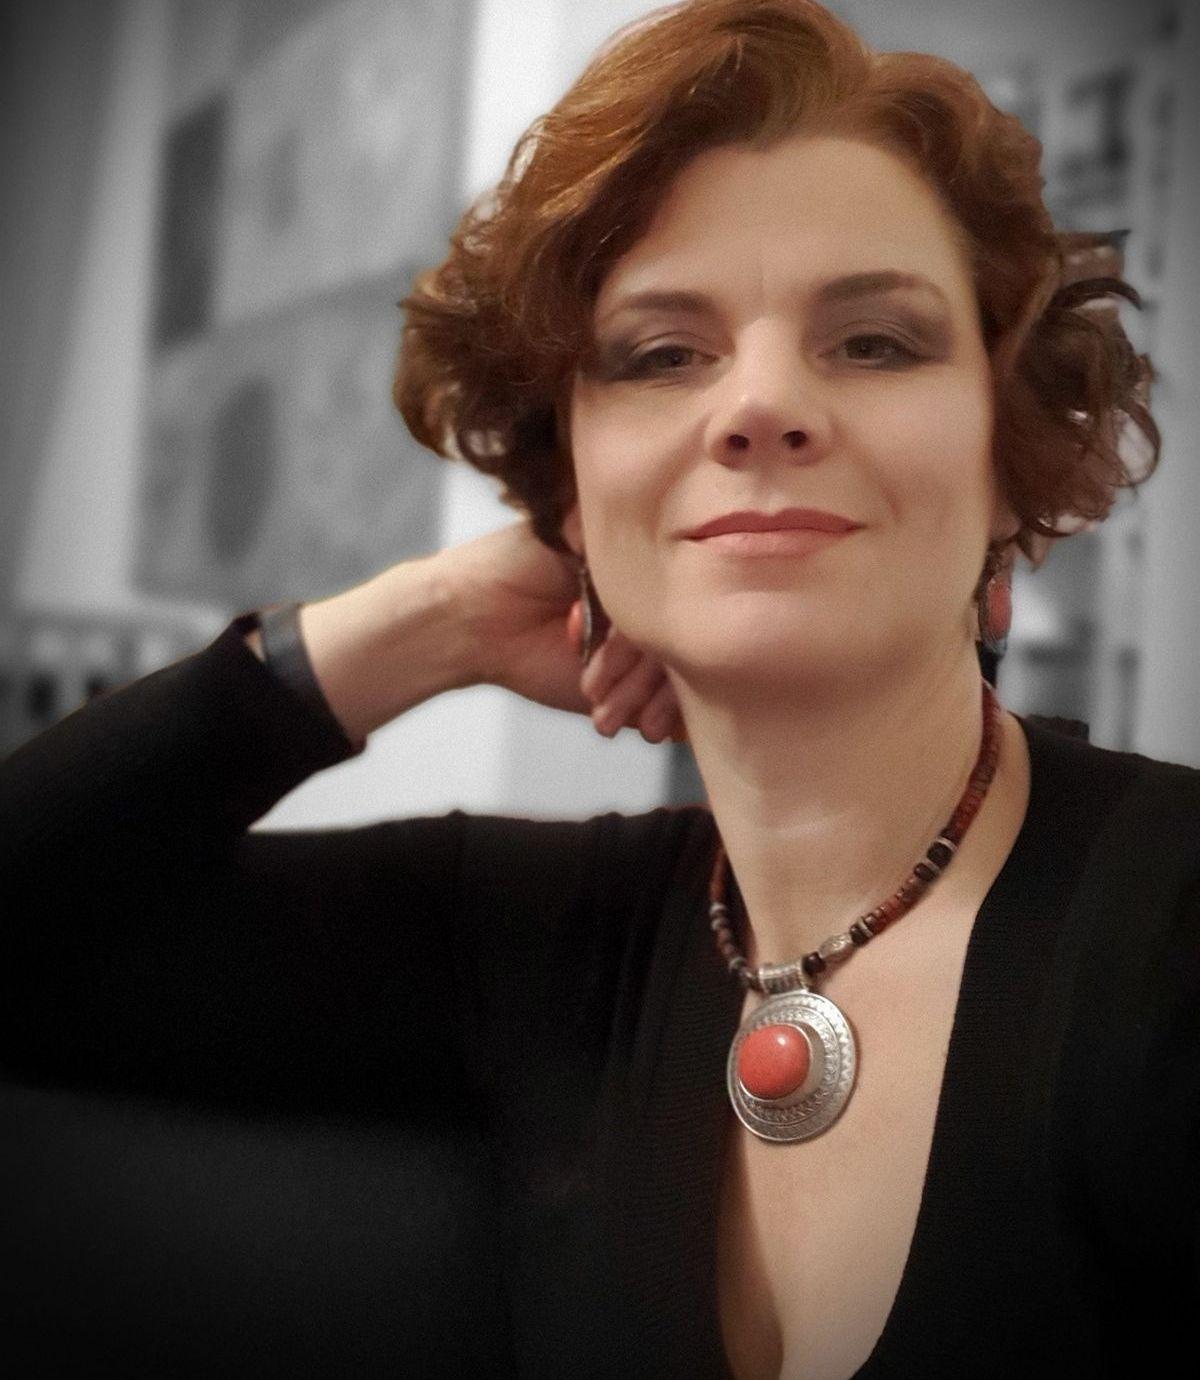 Doris Bach